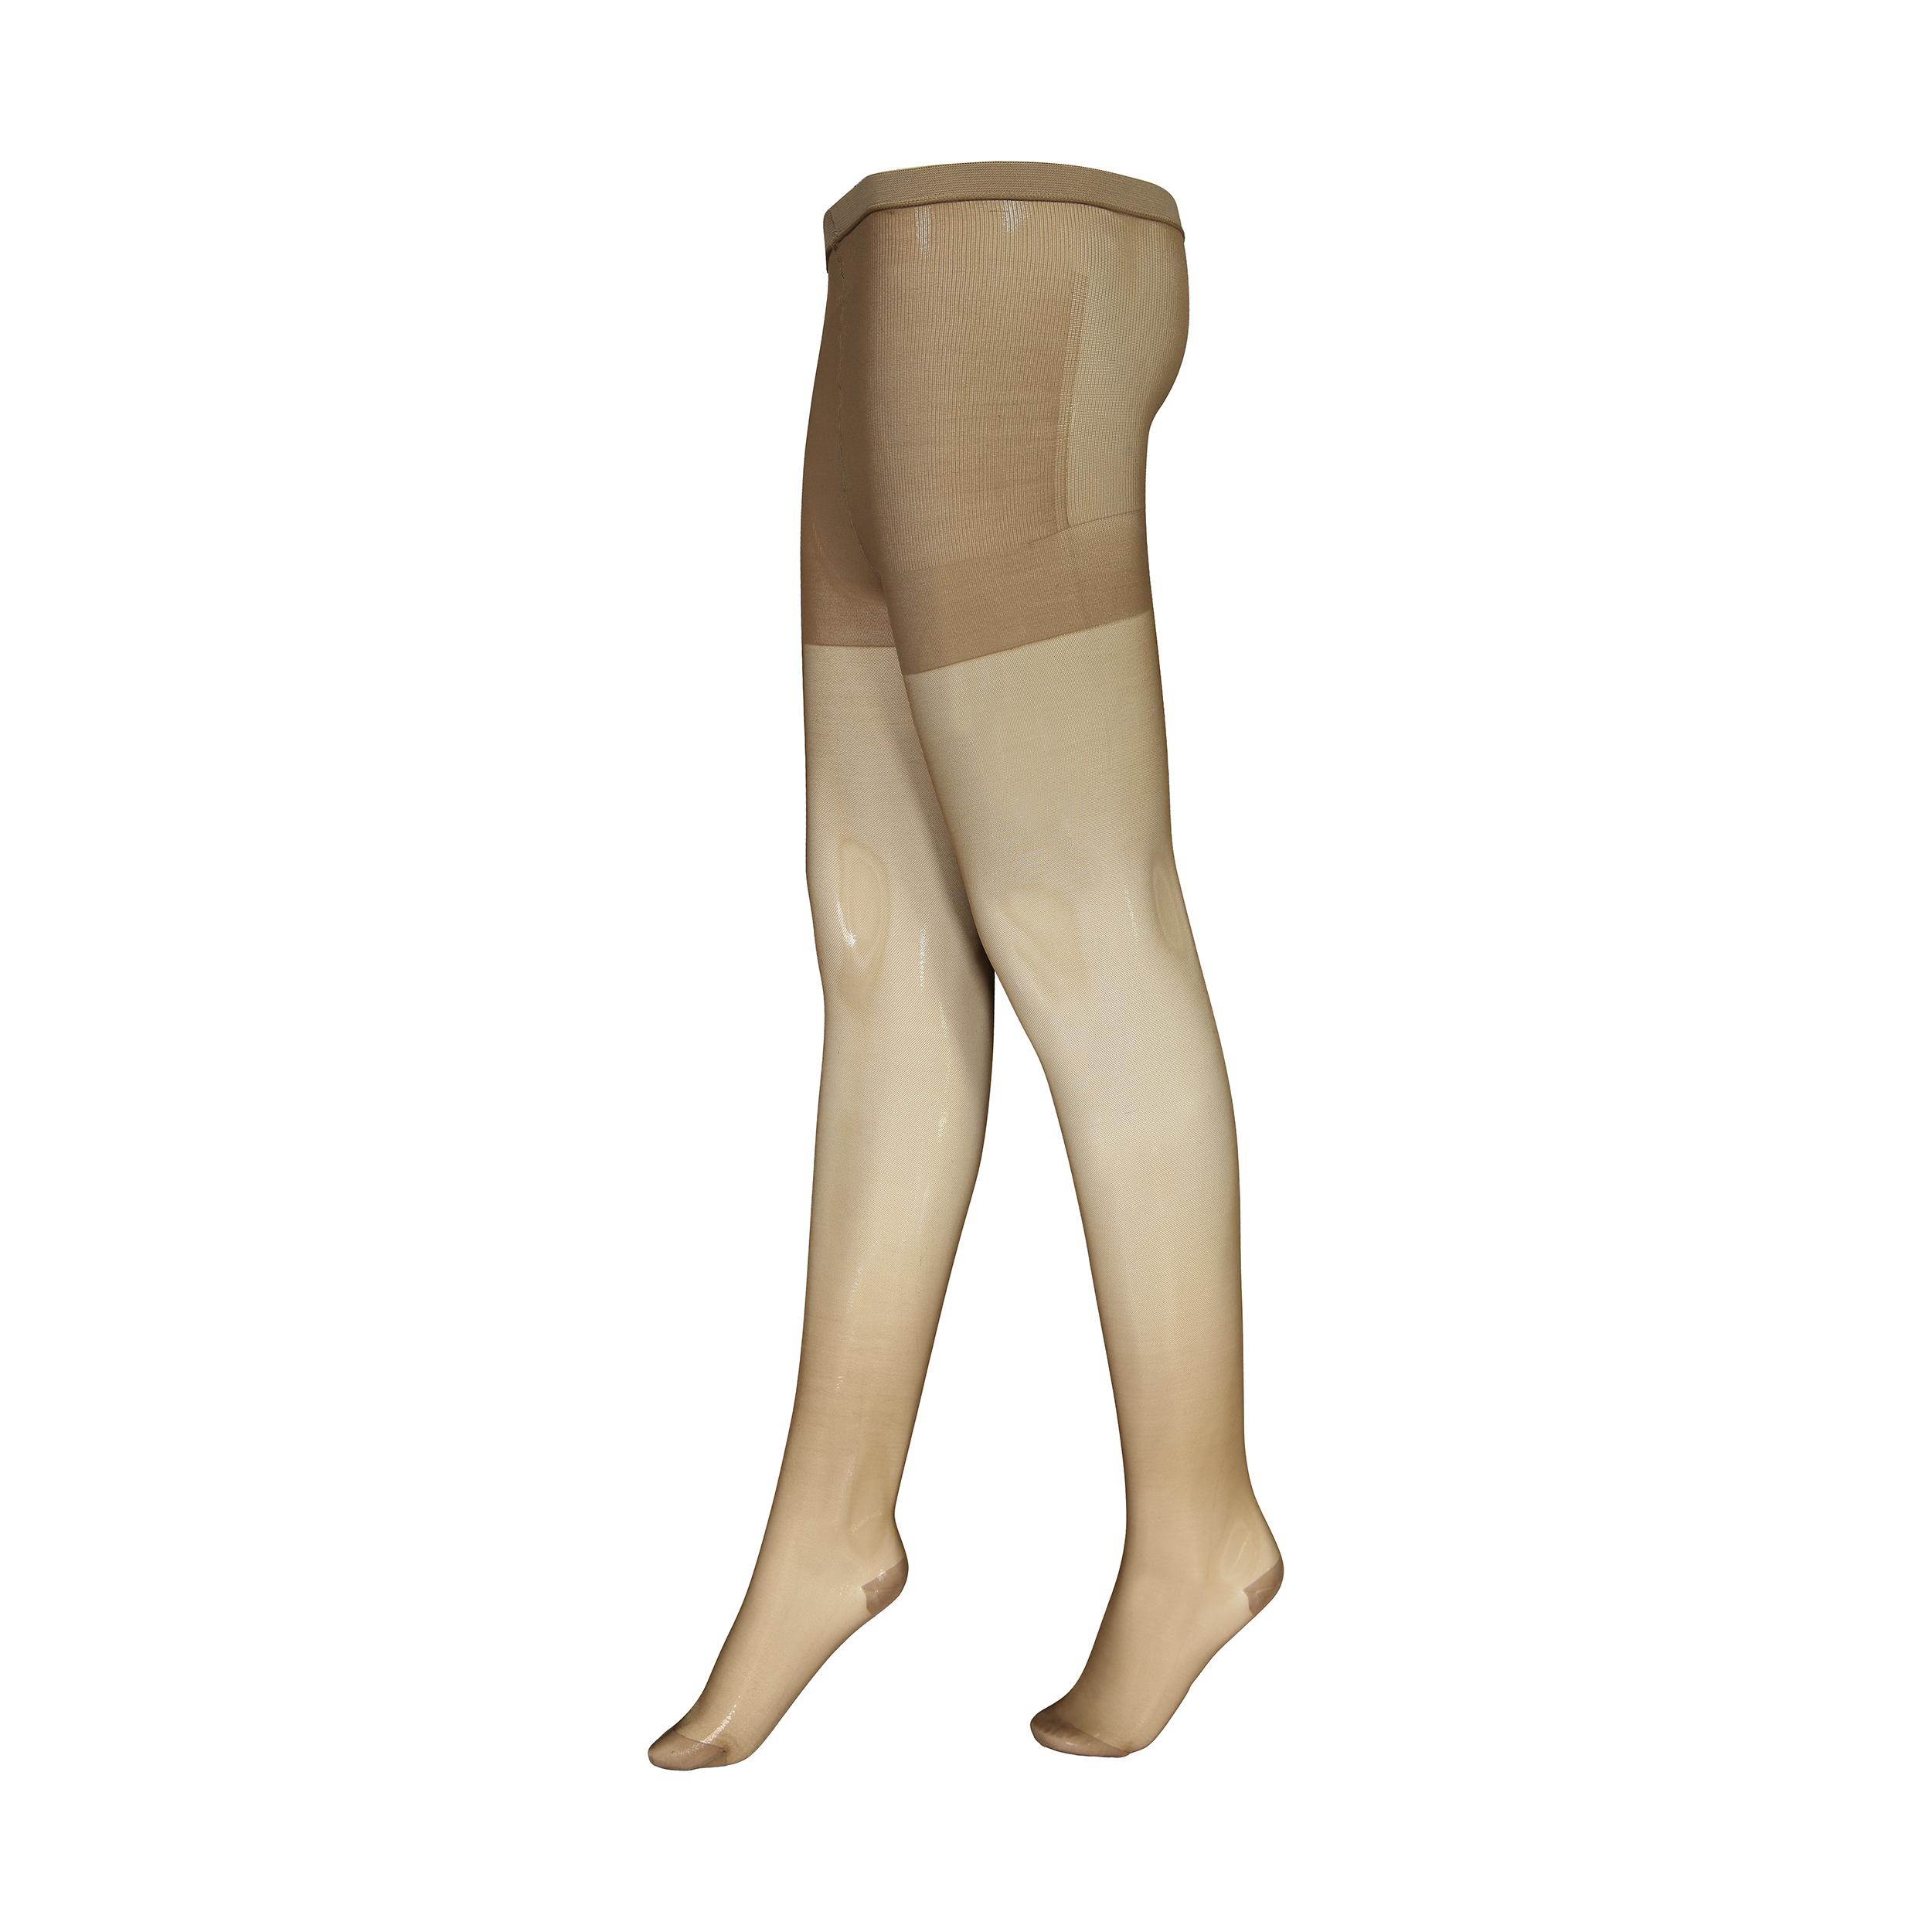 جوراب شلواری زنانه پتیا مدل سوپر اسلیم 70